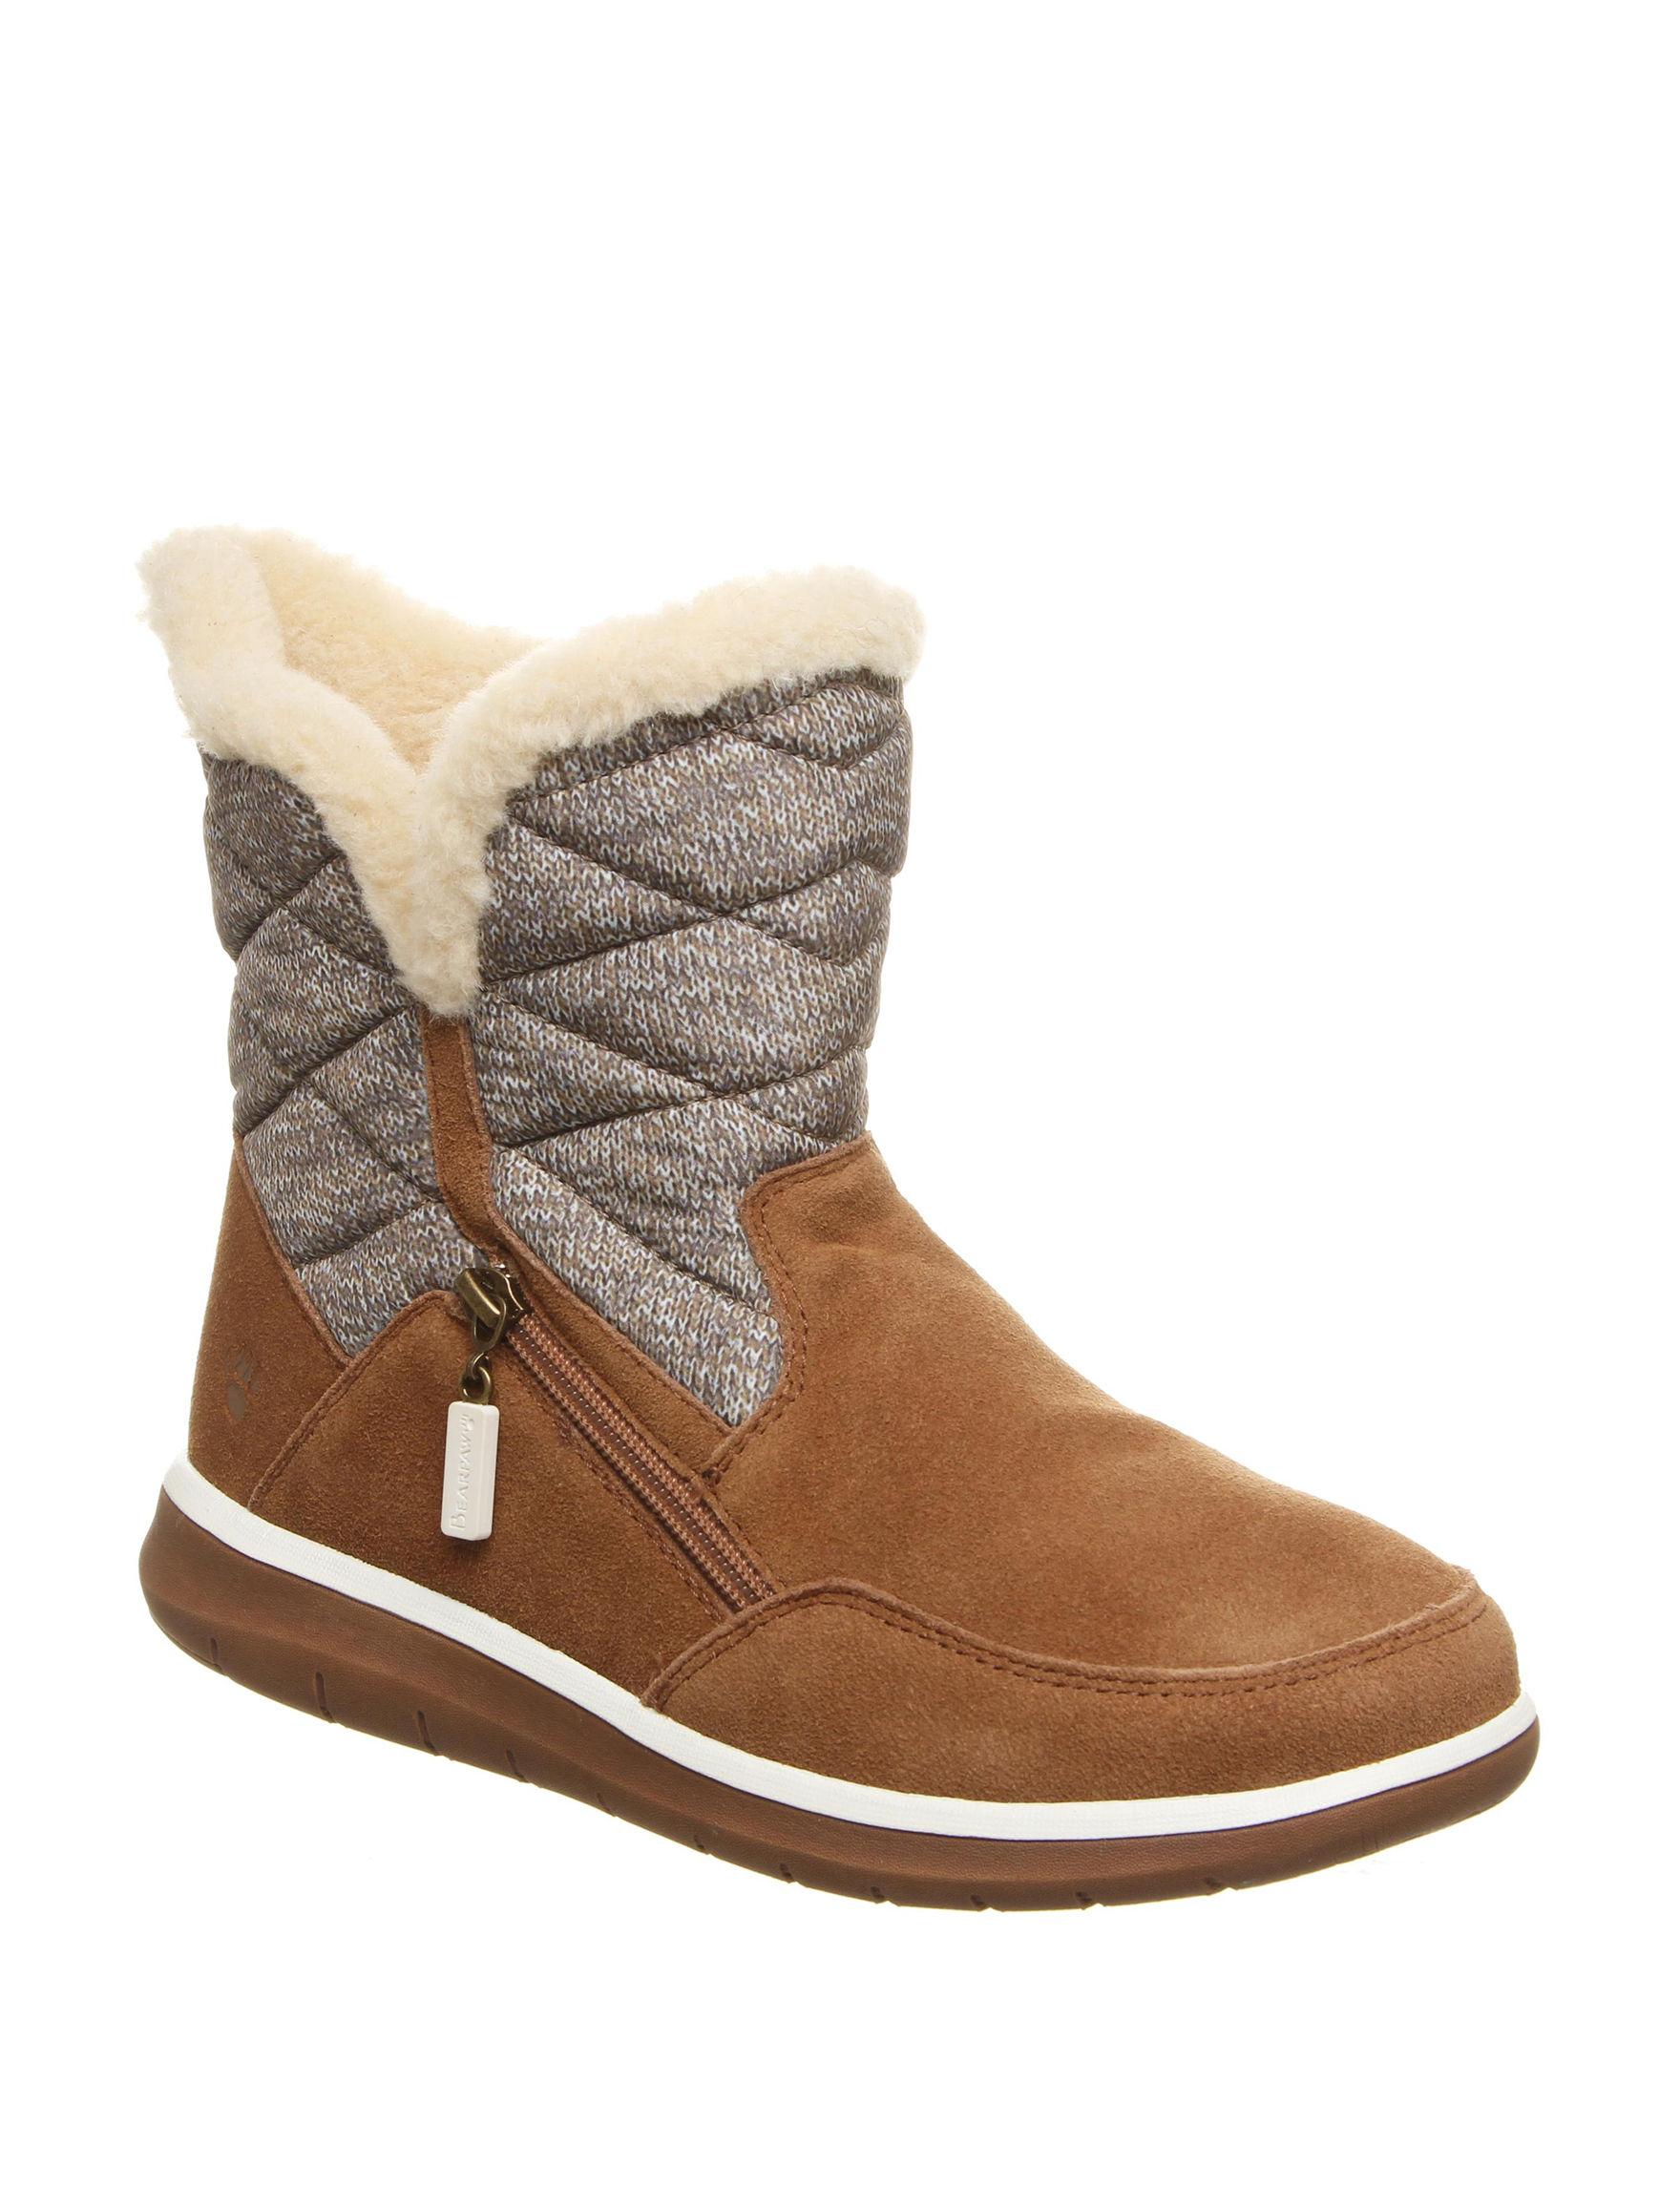 Bearpaw Brown Winter Boots